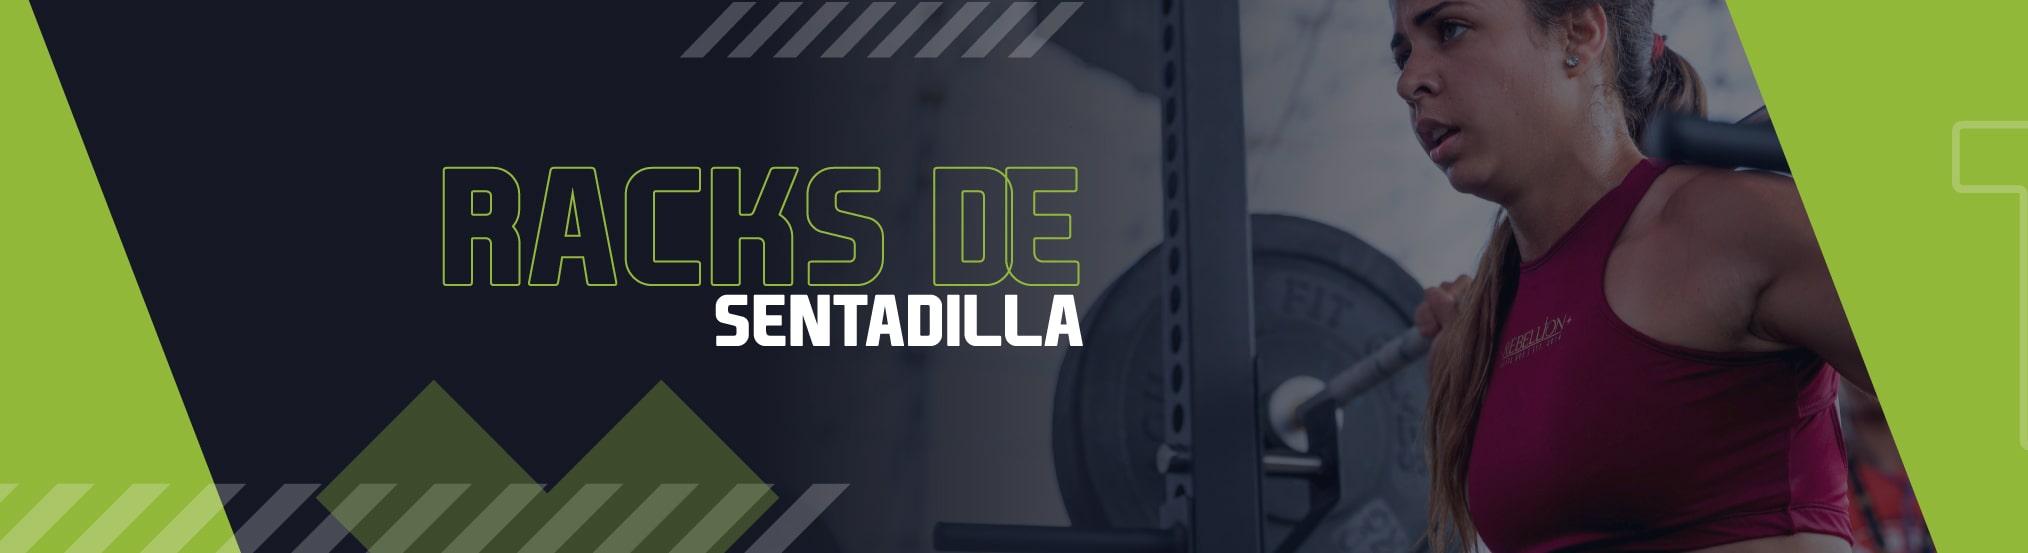 B-RACKS-SENTADILLA-DESK-min